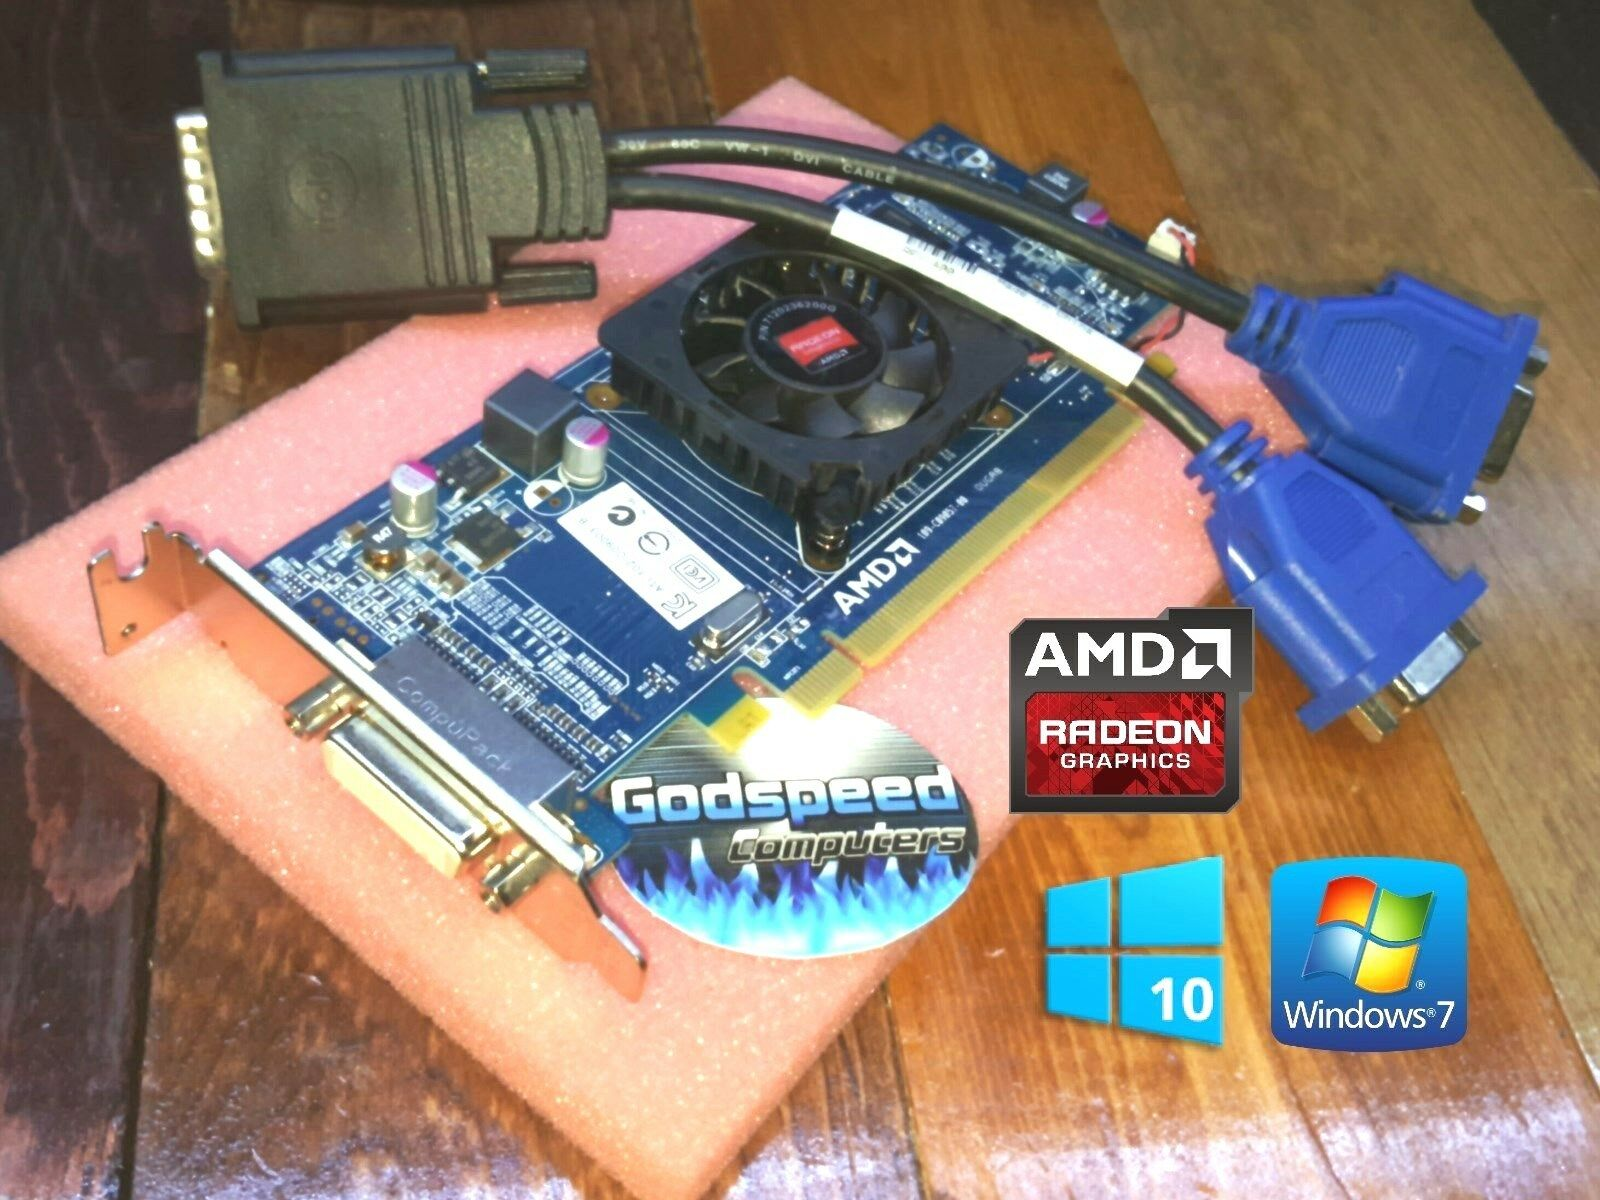 HP Pavilion s5-1214 s5-1217 s5-1218 s5-1224 Slimline Dual Monitor VGA Video Card